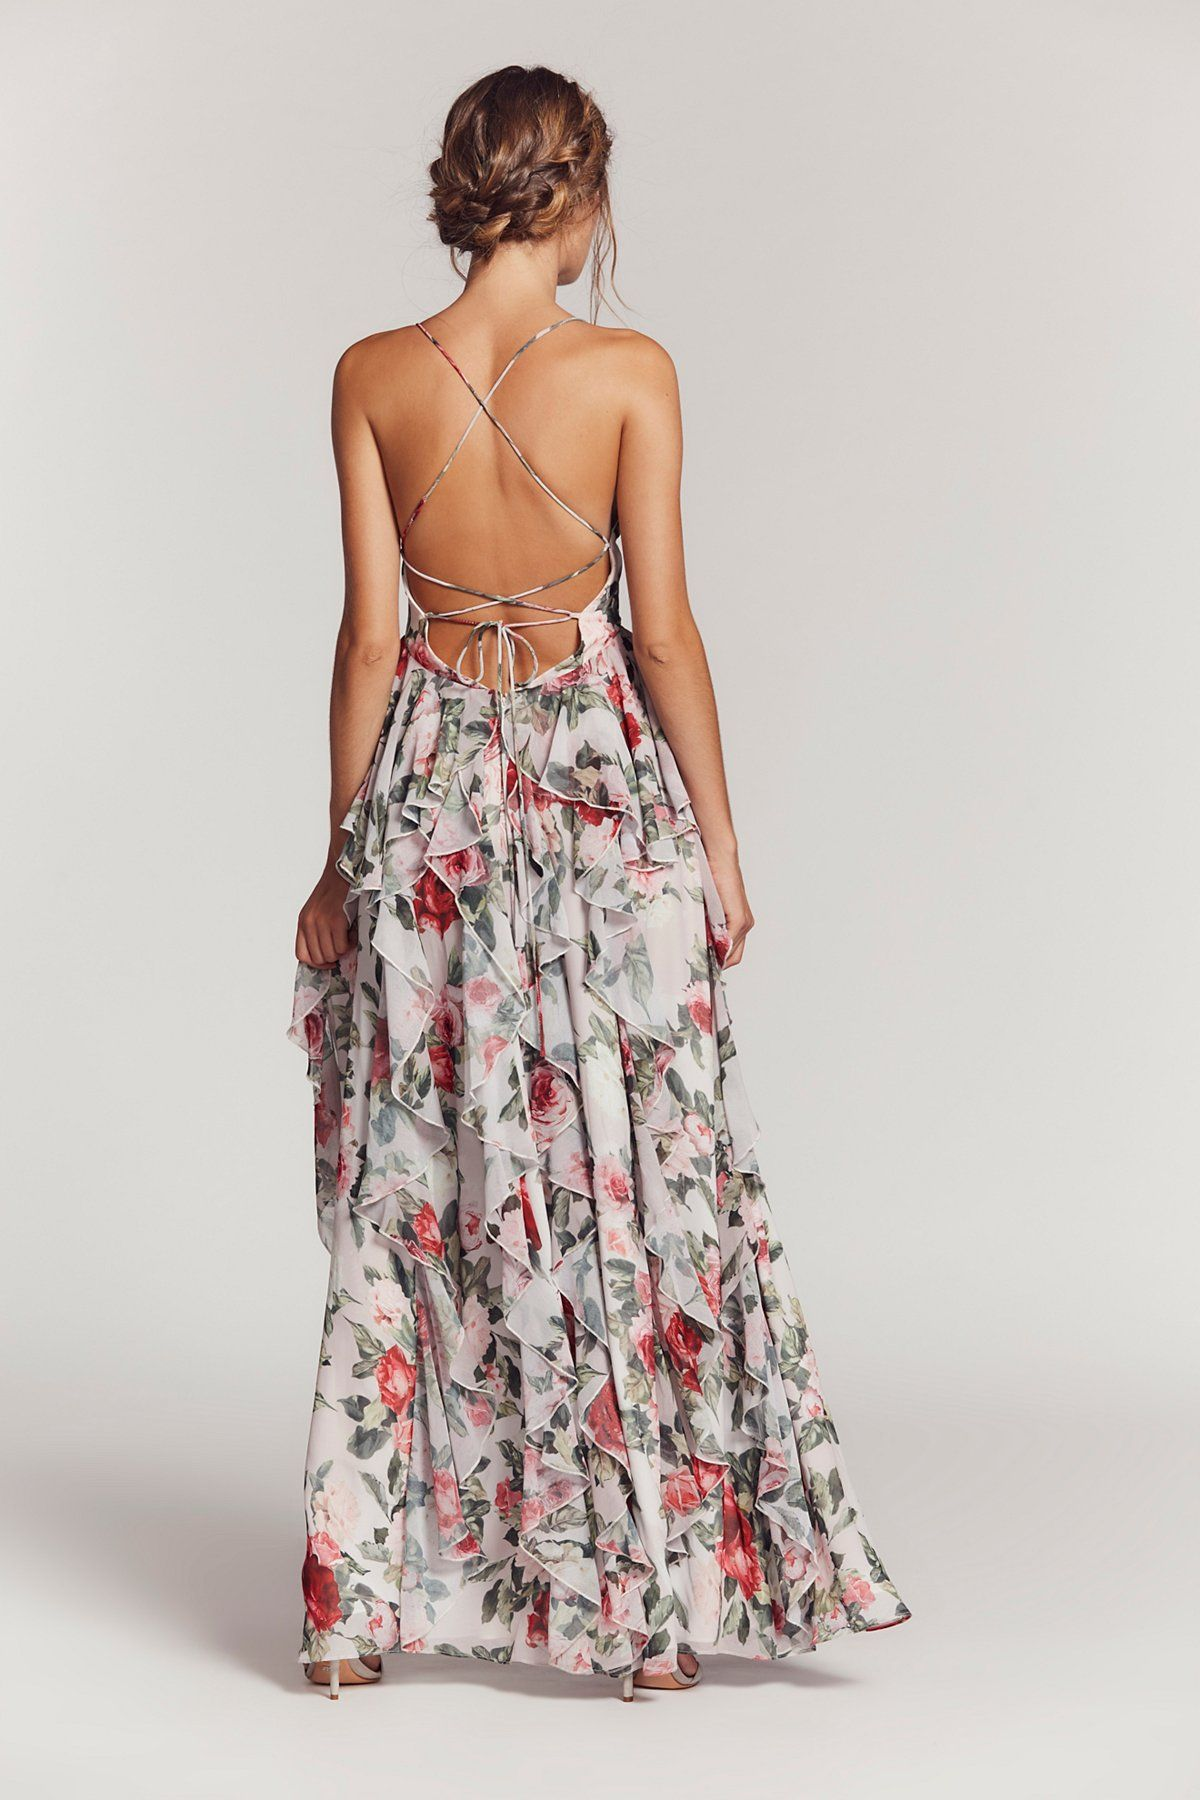 Queen ann maxi dress in stuff i want to buy pinterest